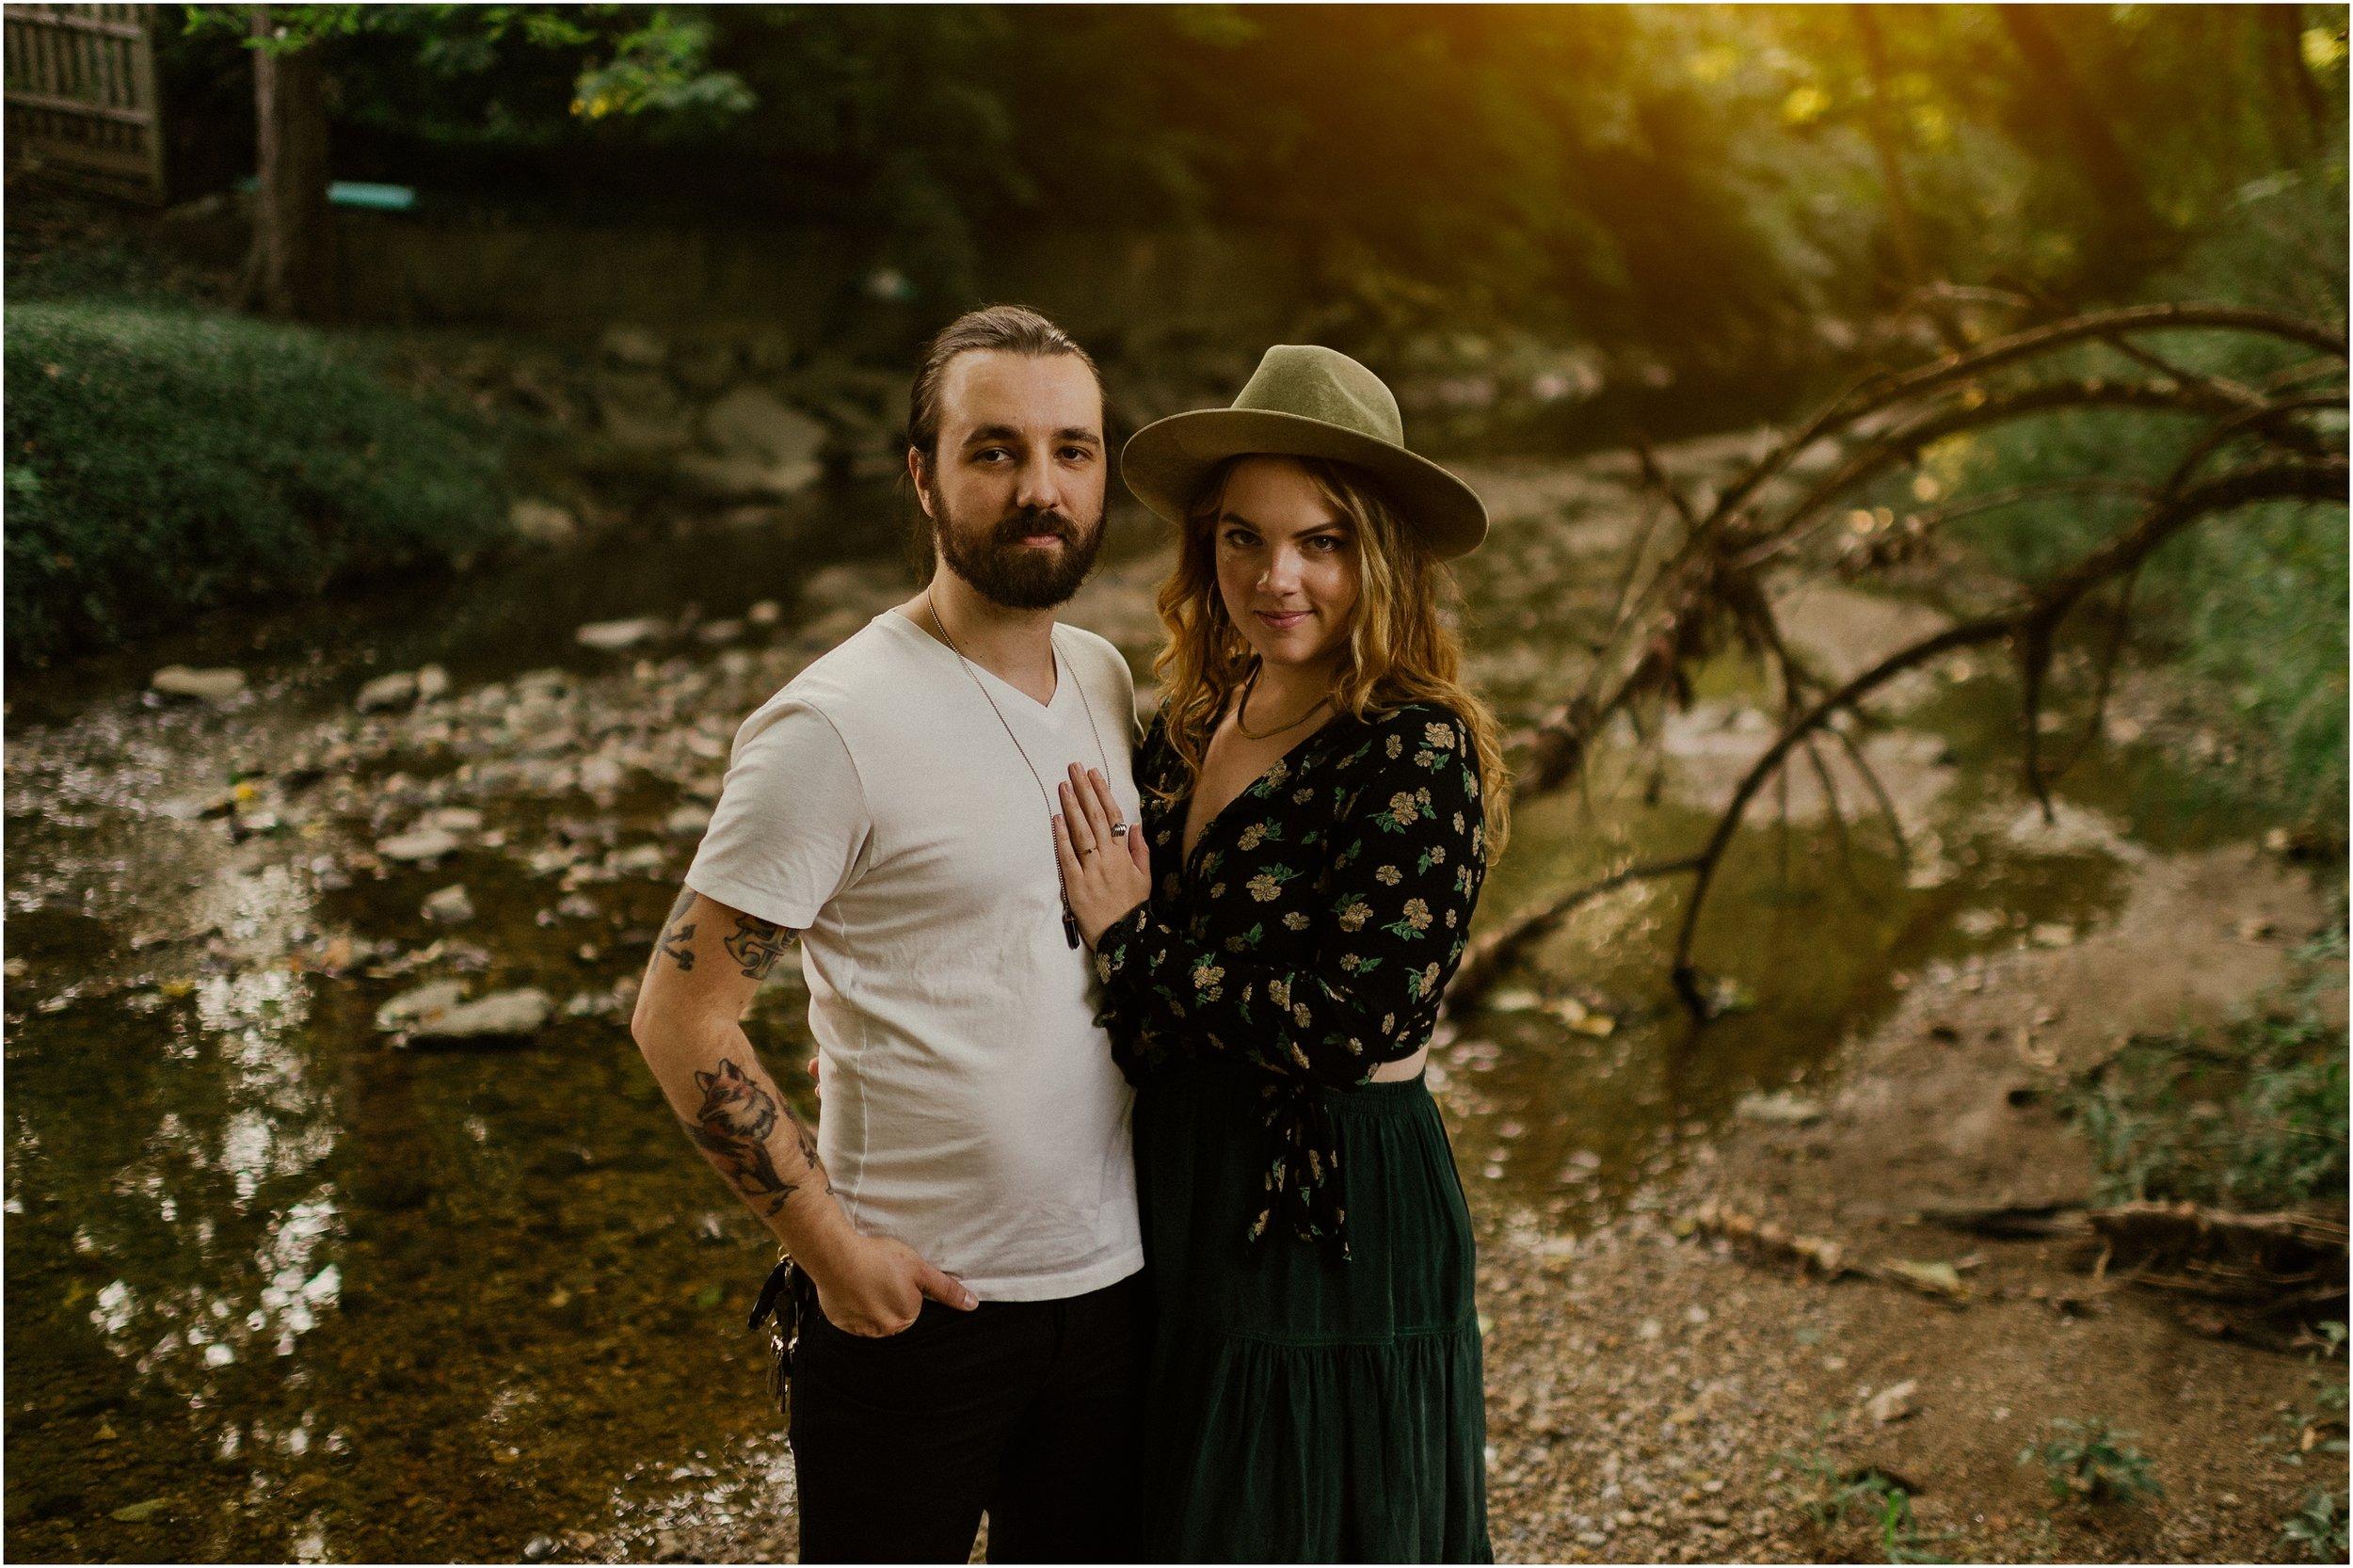 Rebecca_Shehorn_Photography_Indianapolis_Wedding_Photographer_8889.jpg